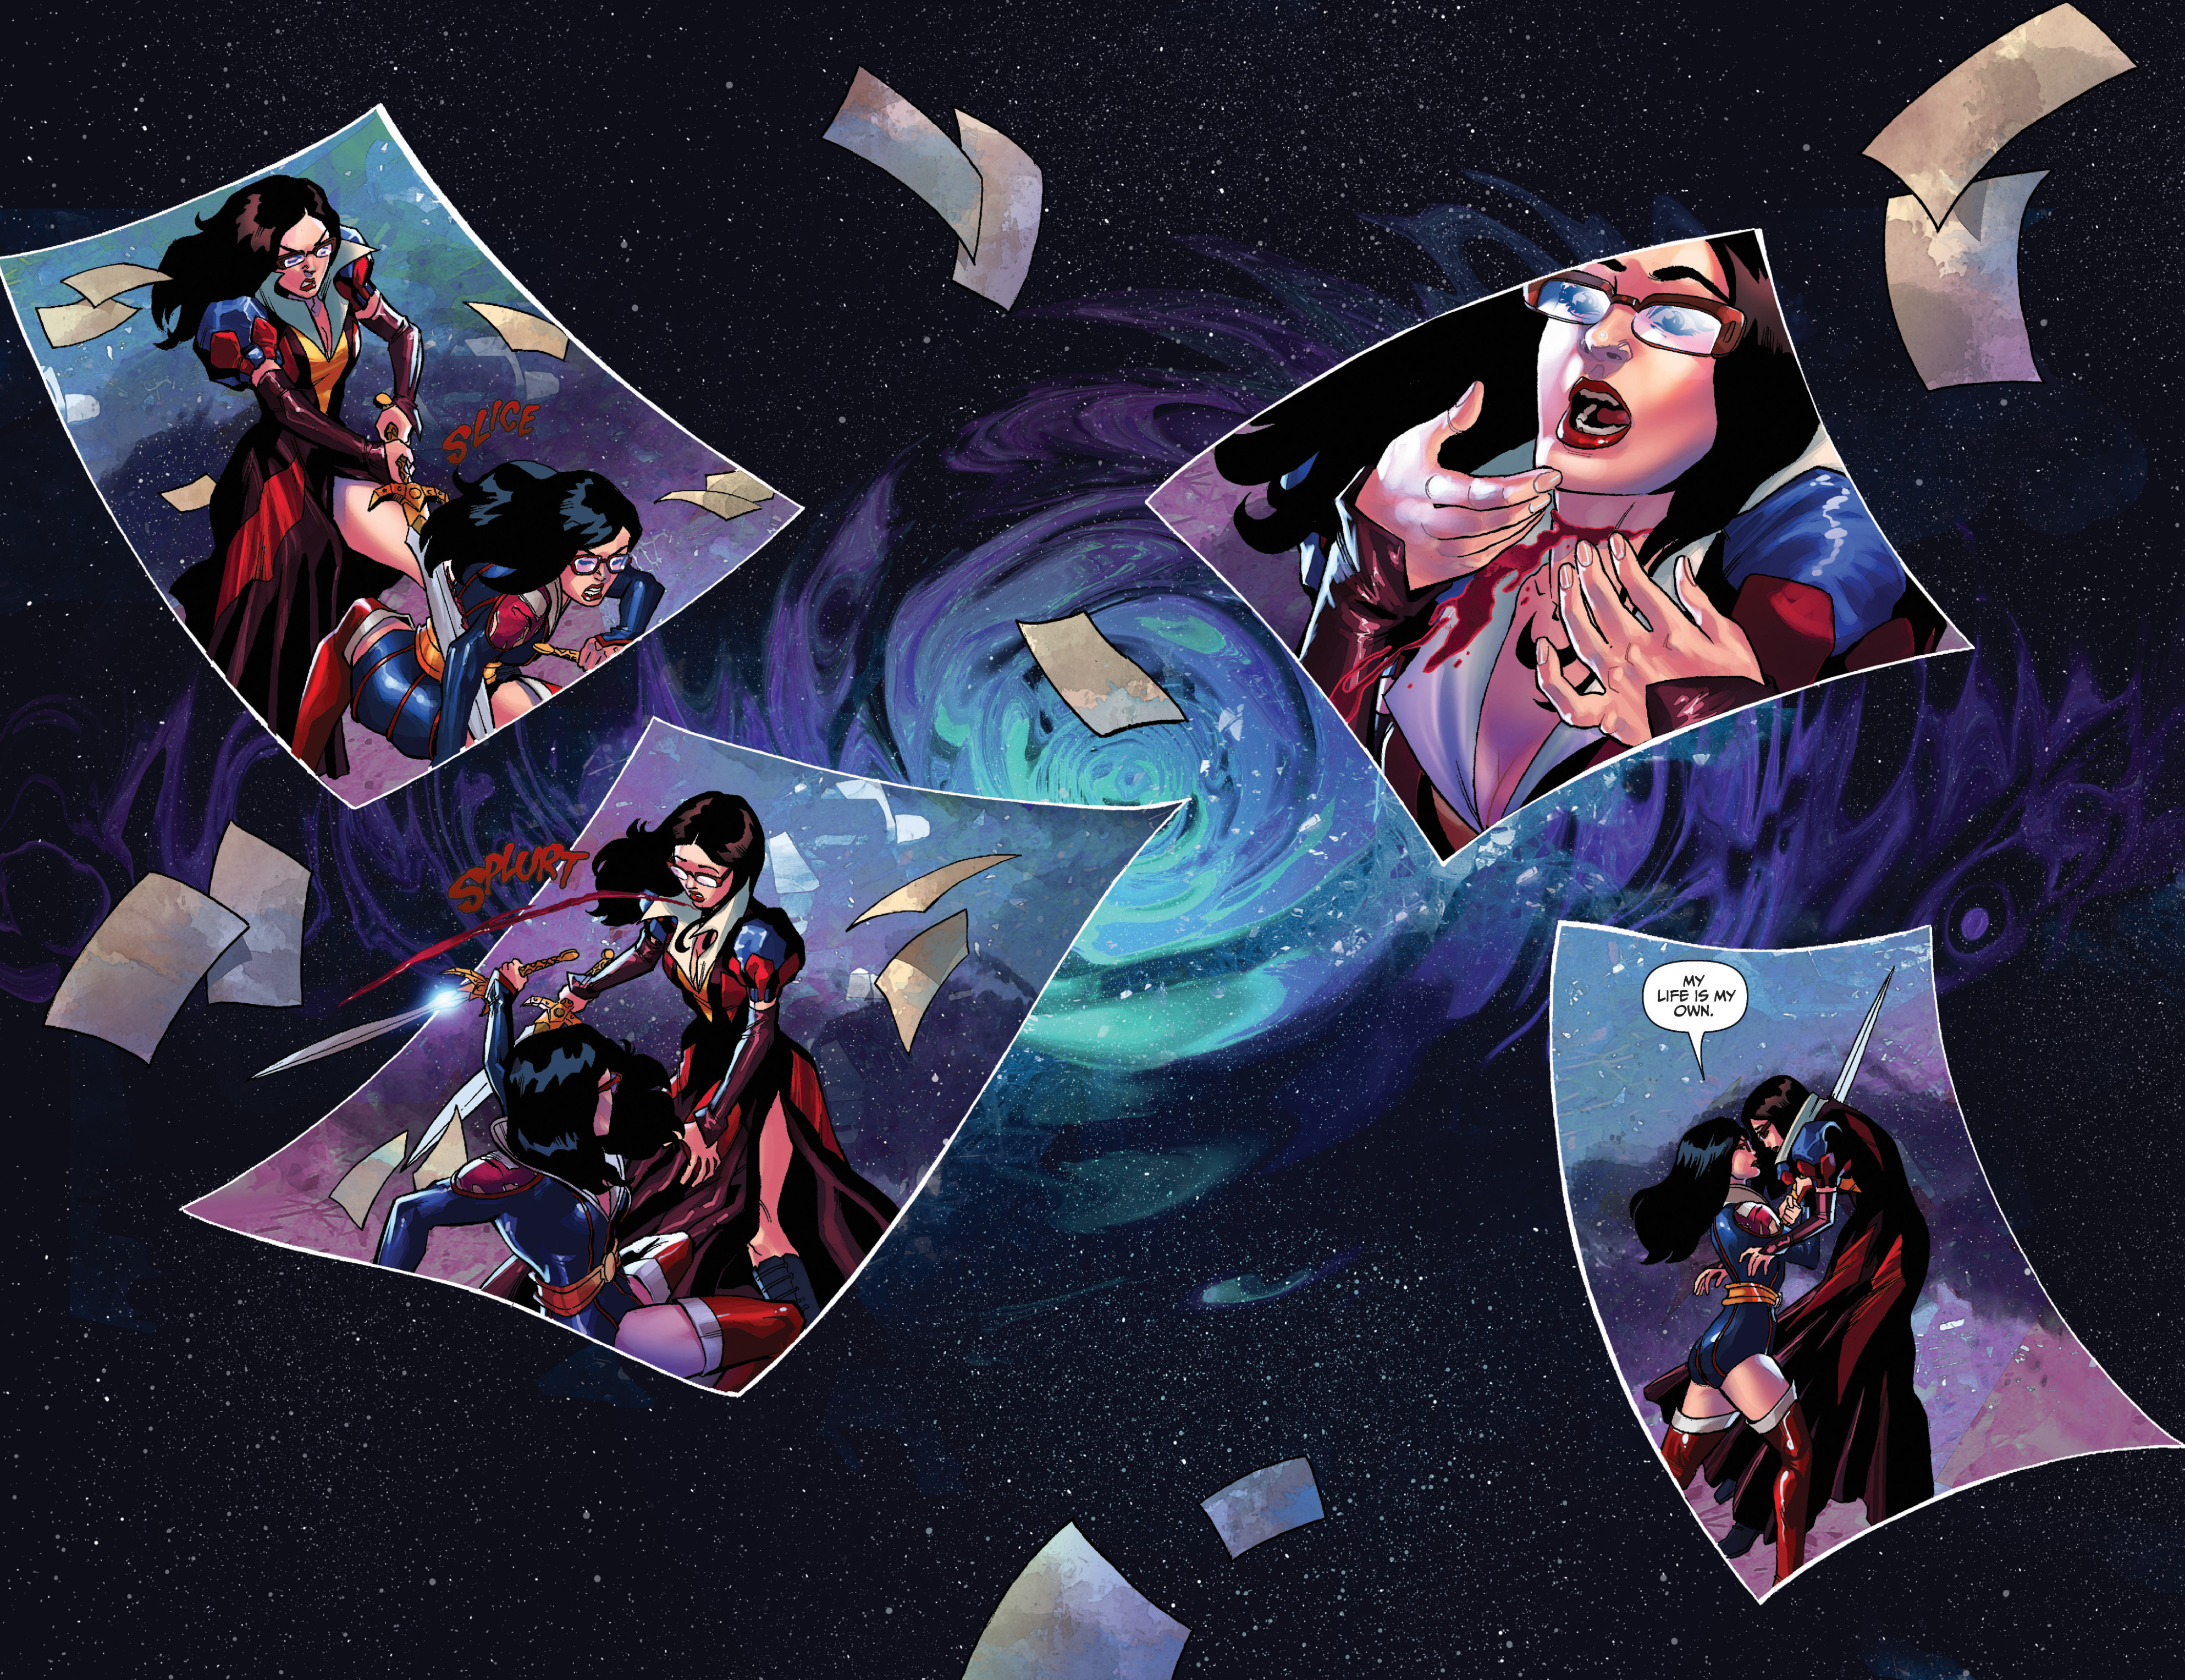 Read online Snow White vs. Snow White comic -  Issue #2 - 27